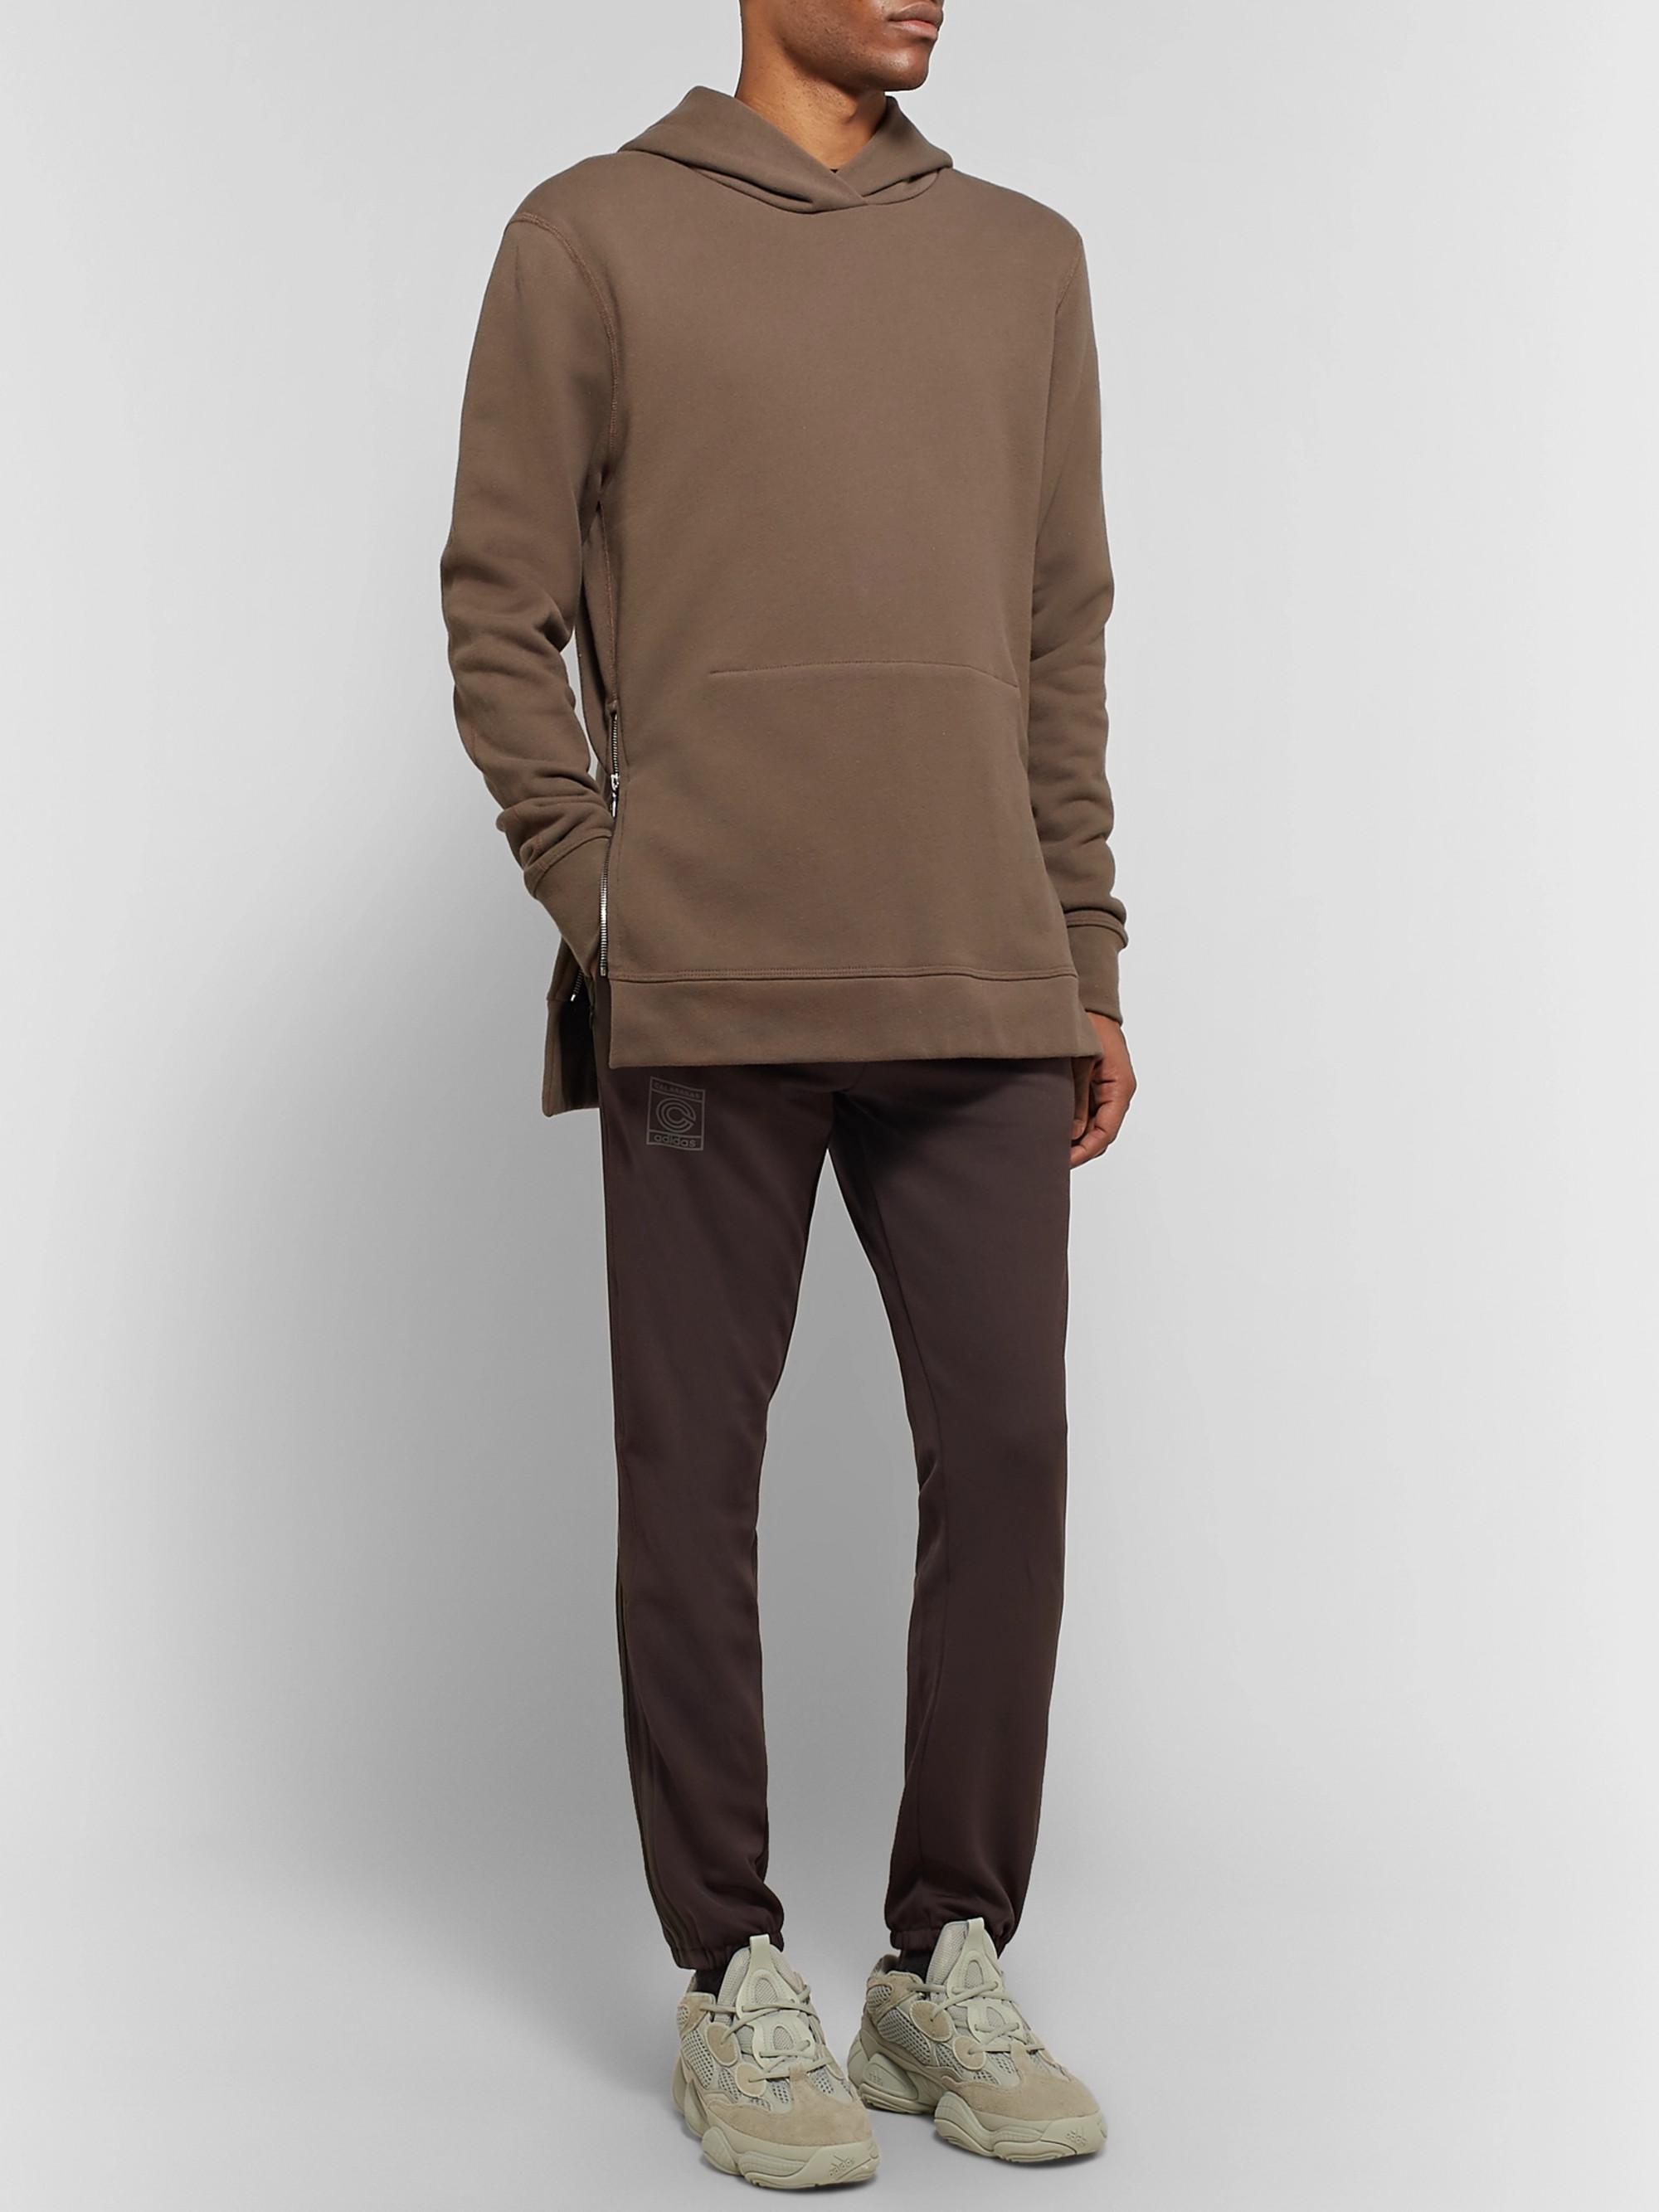 39fcb85d Dark brown + Yeezy Calabasas Striped Jersey Sweatpants   adidas ...